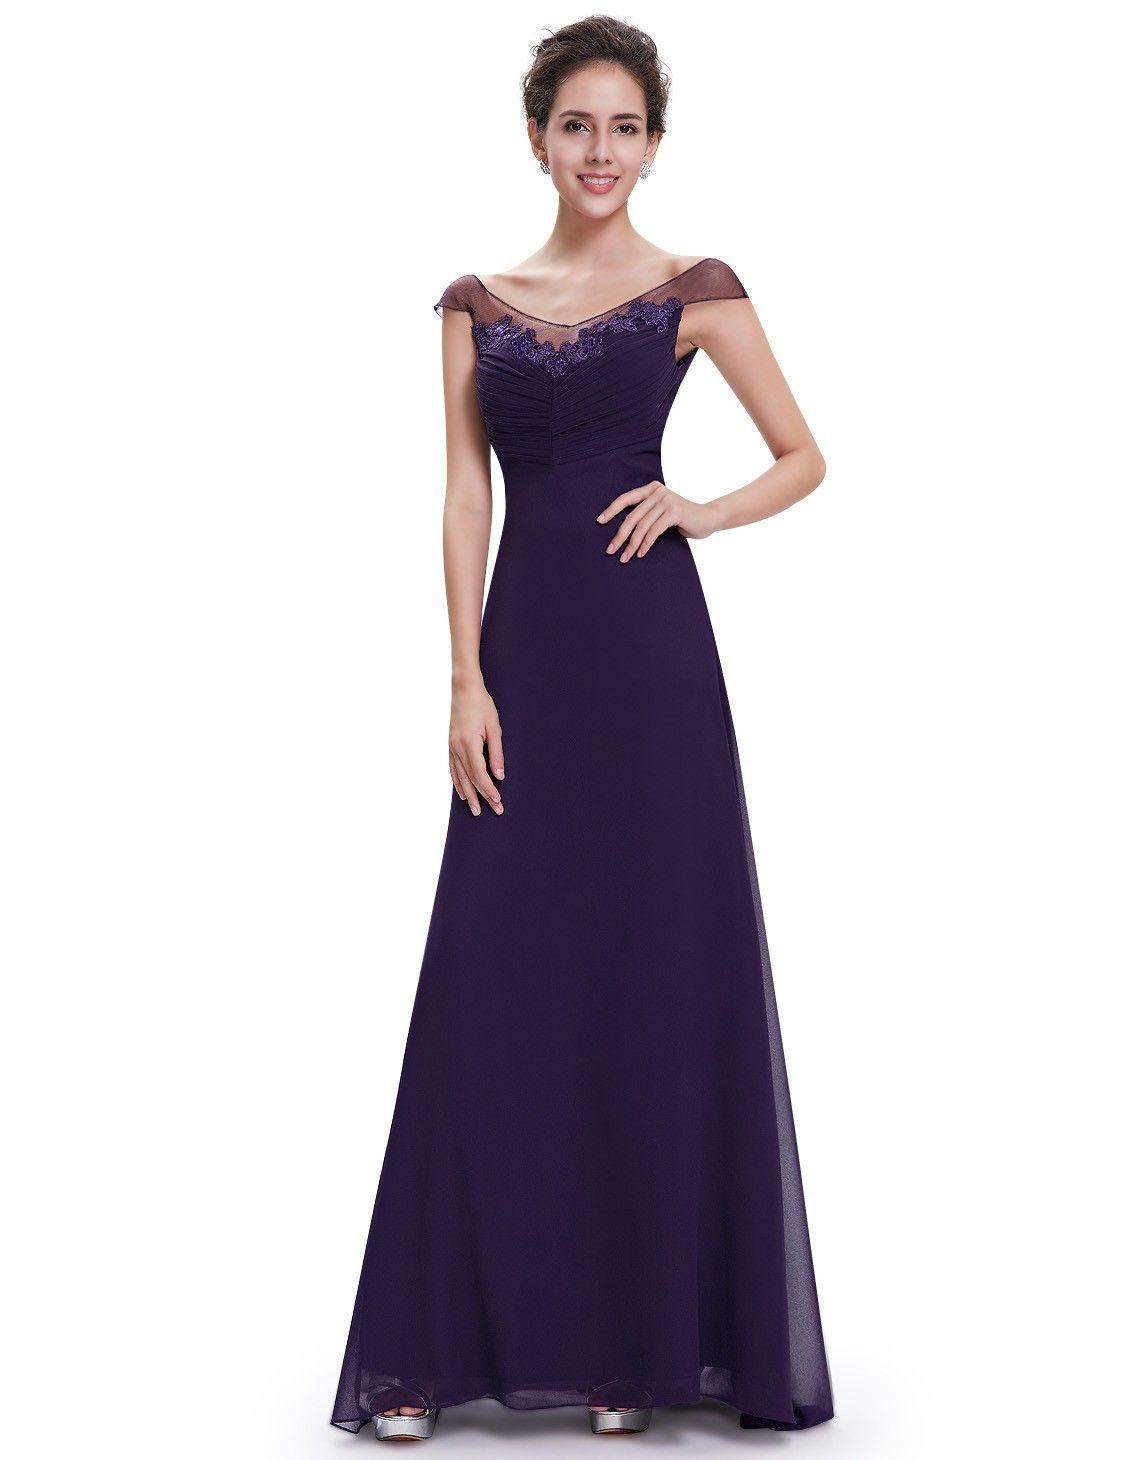 17 Genial Abendkleid Online Vertrieb13 Cool Abendkleid Online Boutique